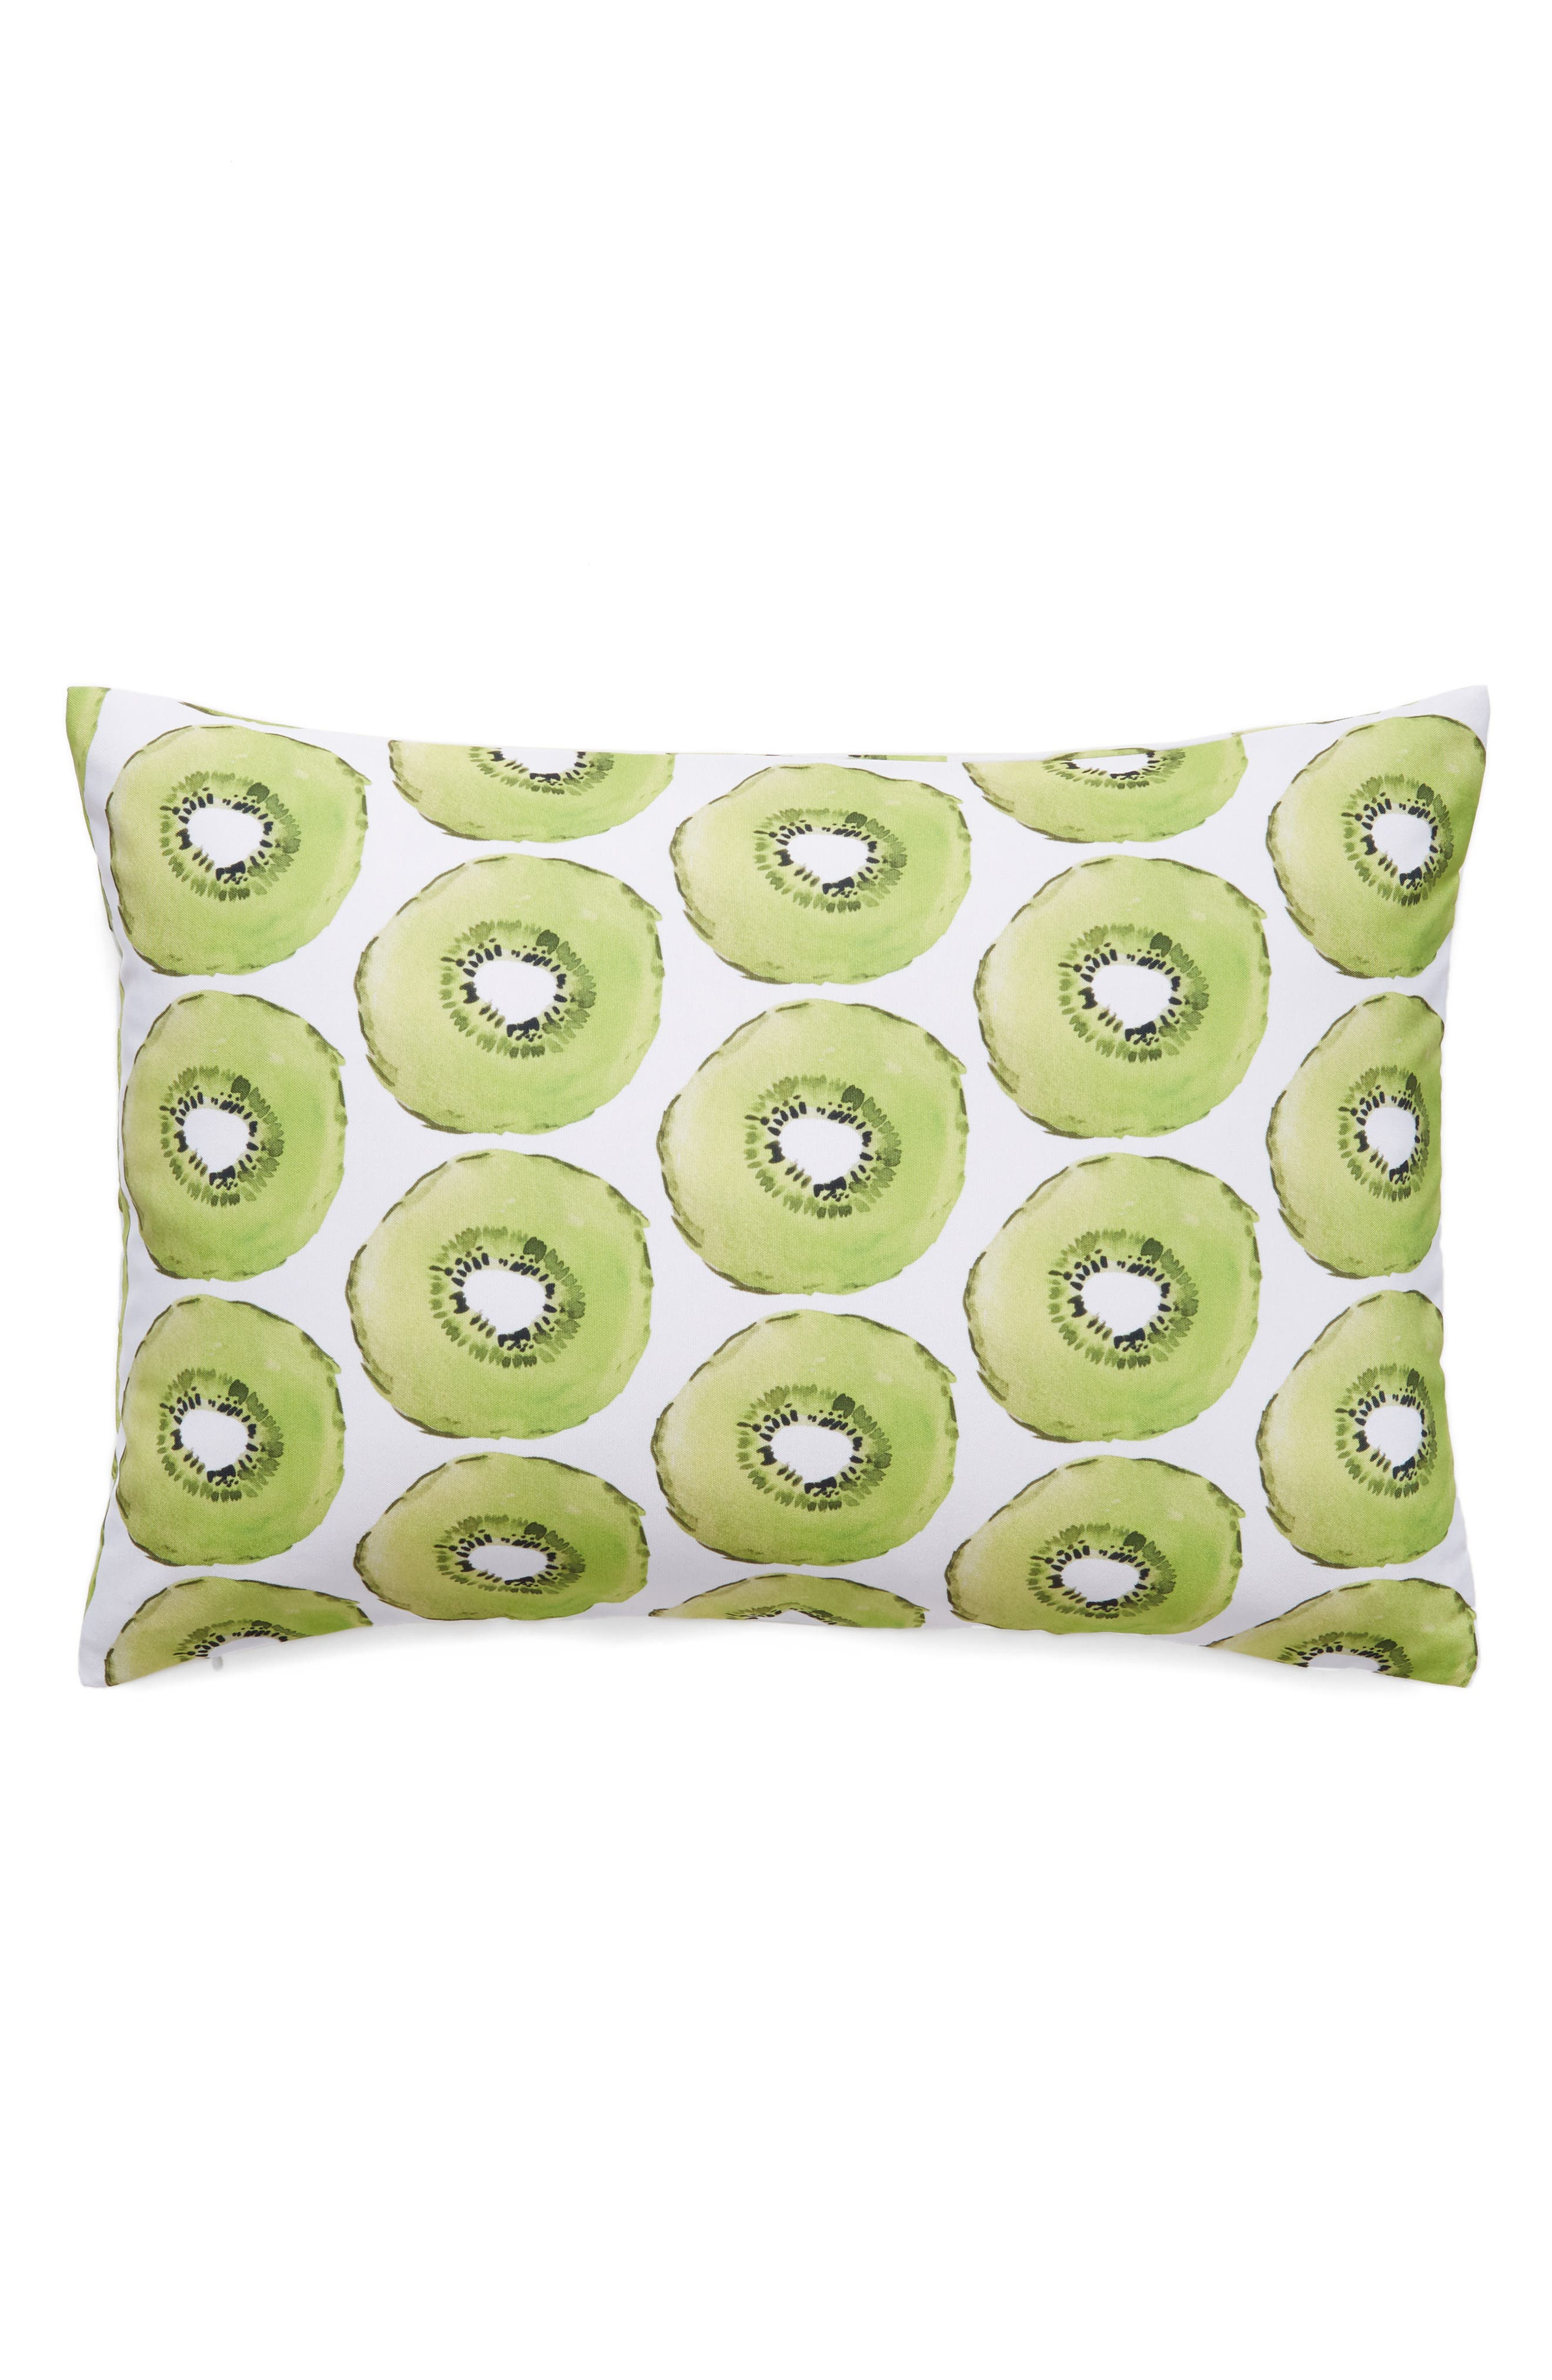 Main Image - Levtex Kiwi Accent Pillow